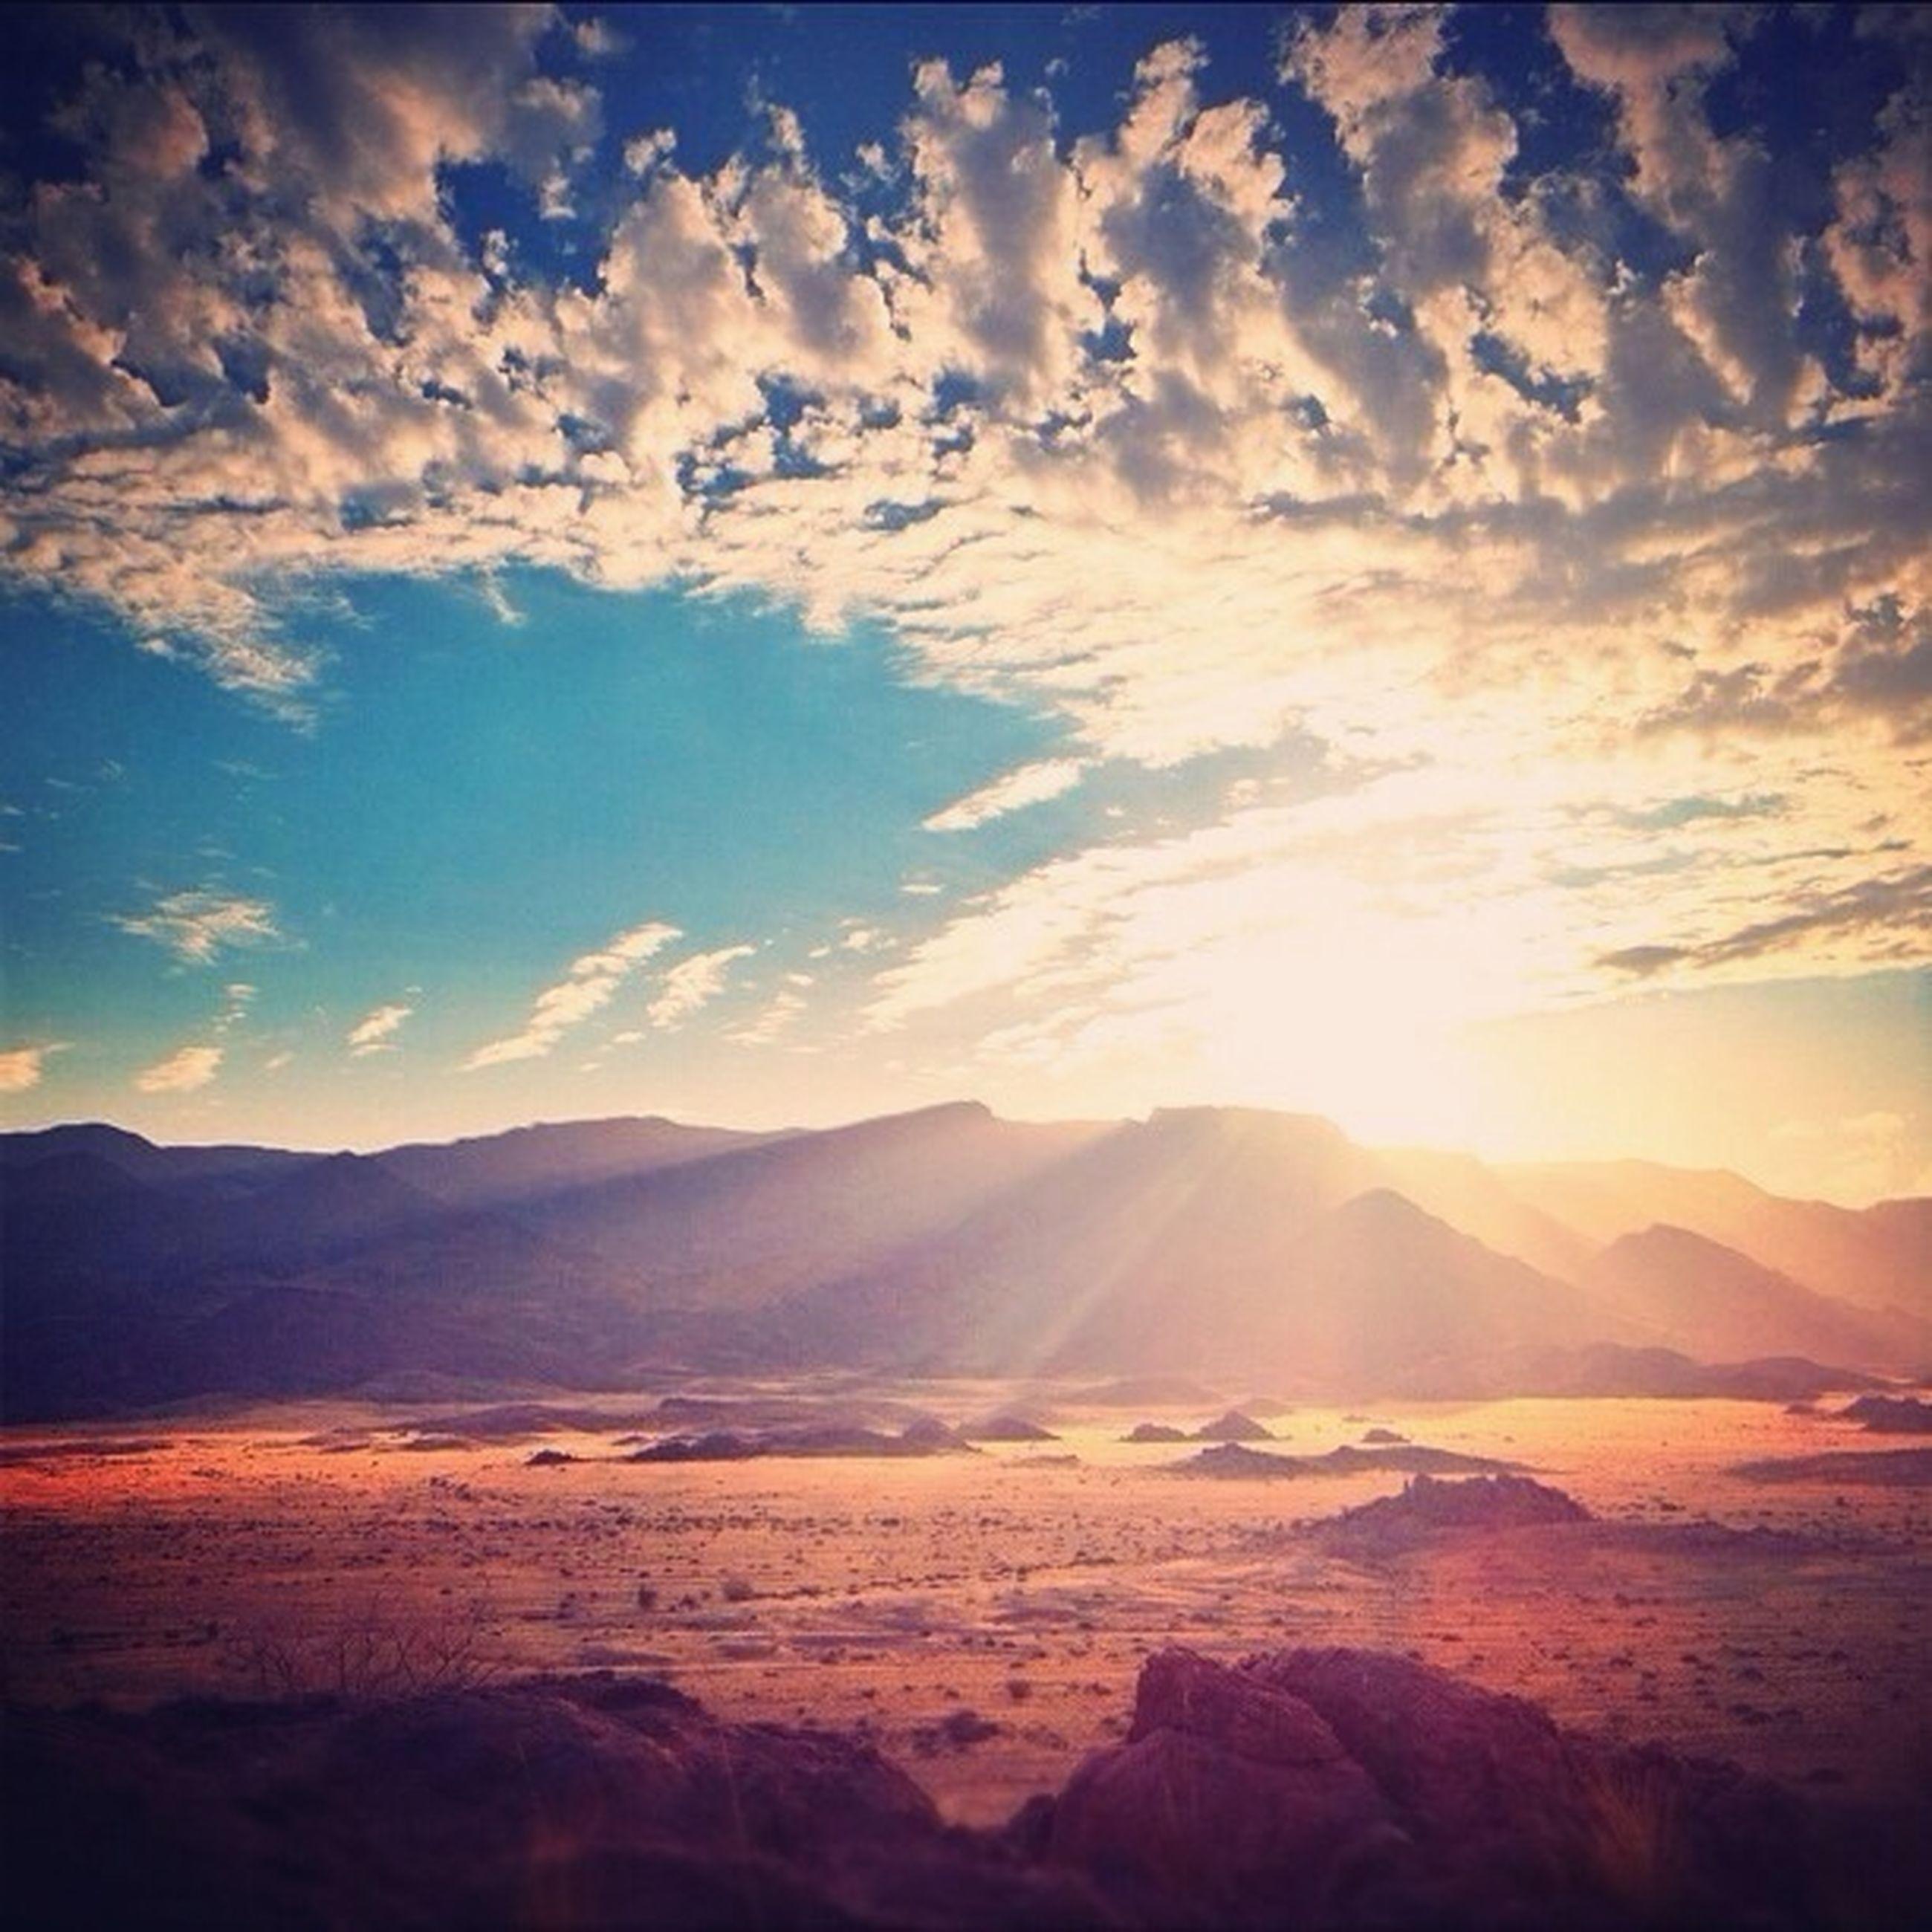 tranquil scene, mountain, scenics, tranquility, sky, landscape, beauty in nature, mountain range, cloud - sky, nature, sunset, sun, sunlight, cloud, non-urban scene, sunbeam, idyllic, remote, physical geography, horizon over land